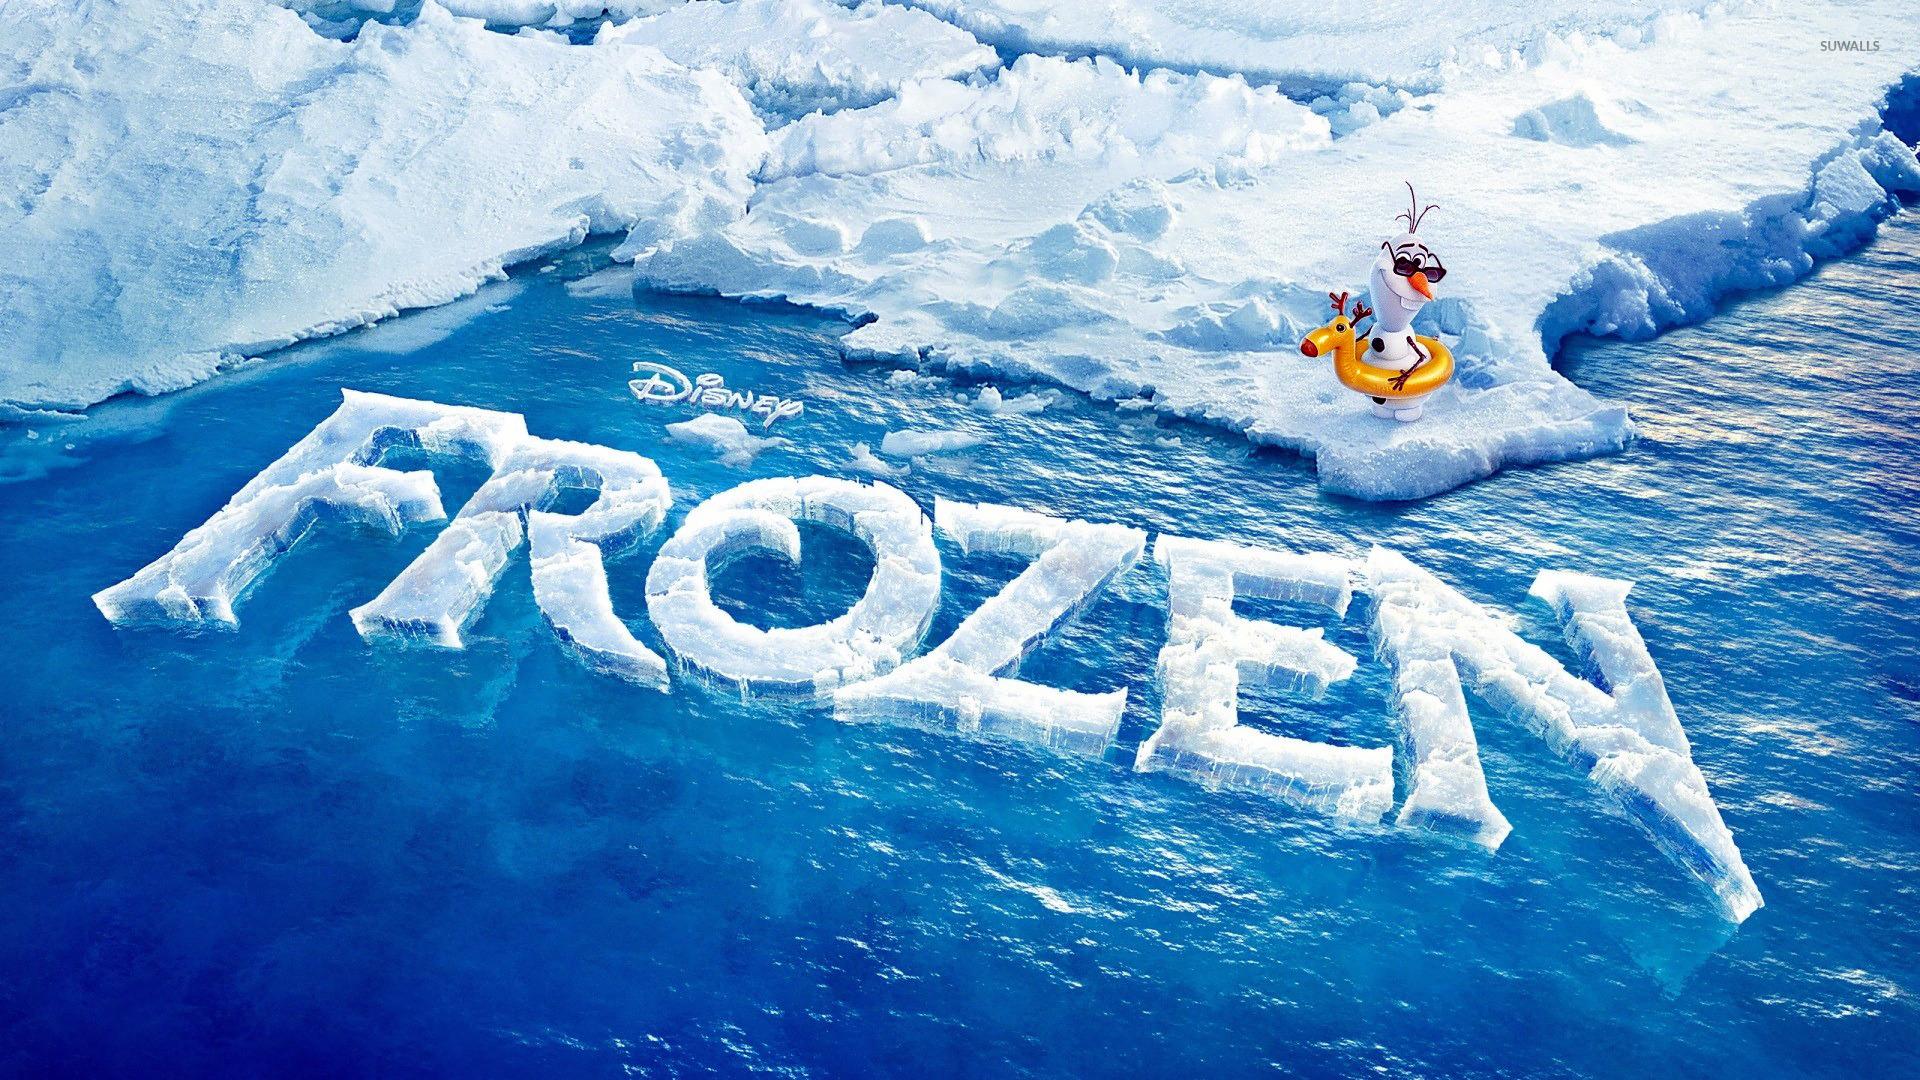 Olaf Frozen 3 Wallpaper Cartoon Wallpapers 22992